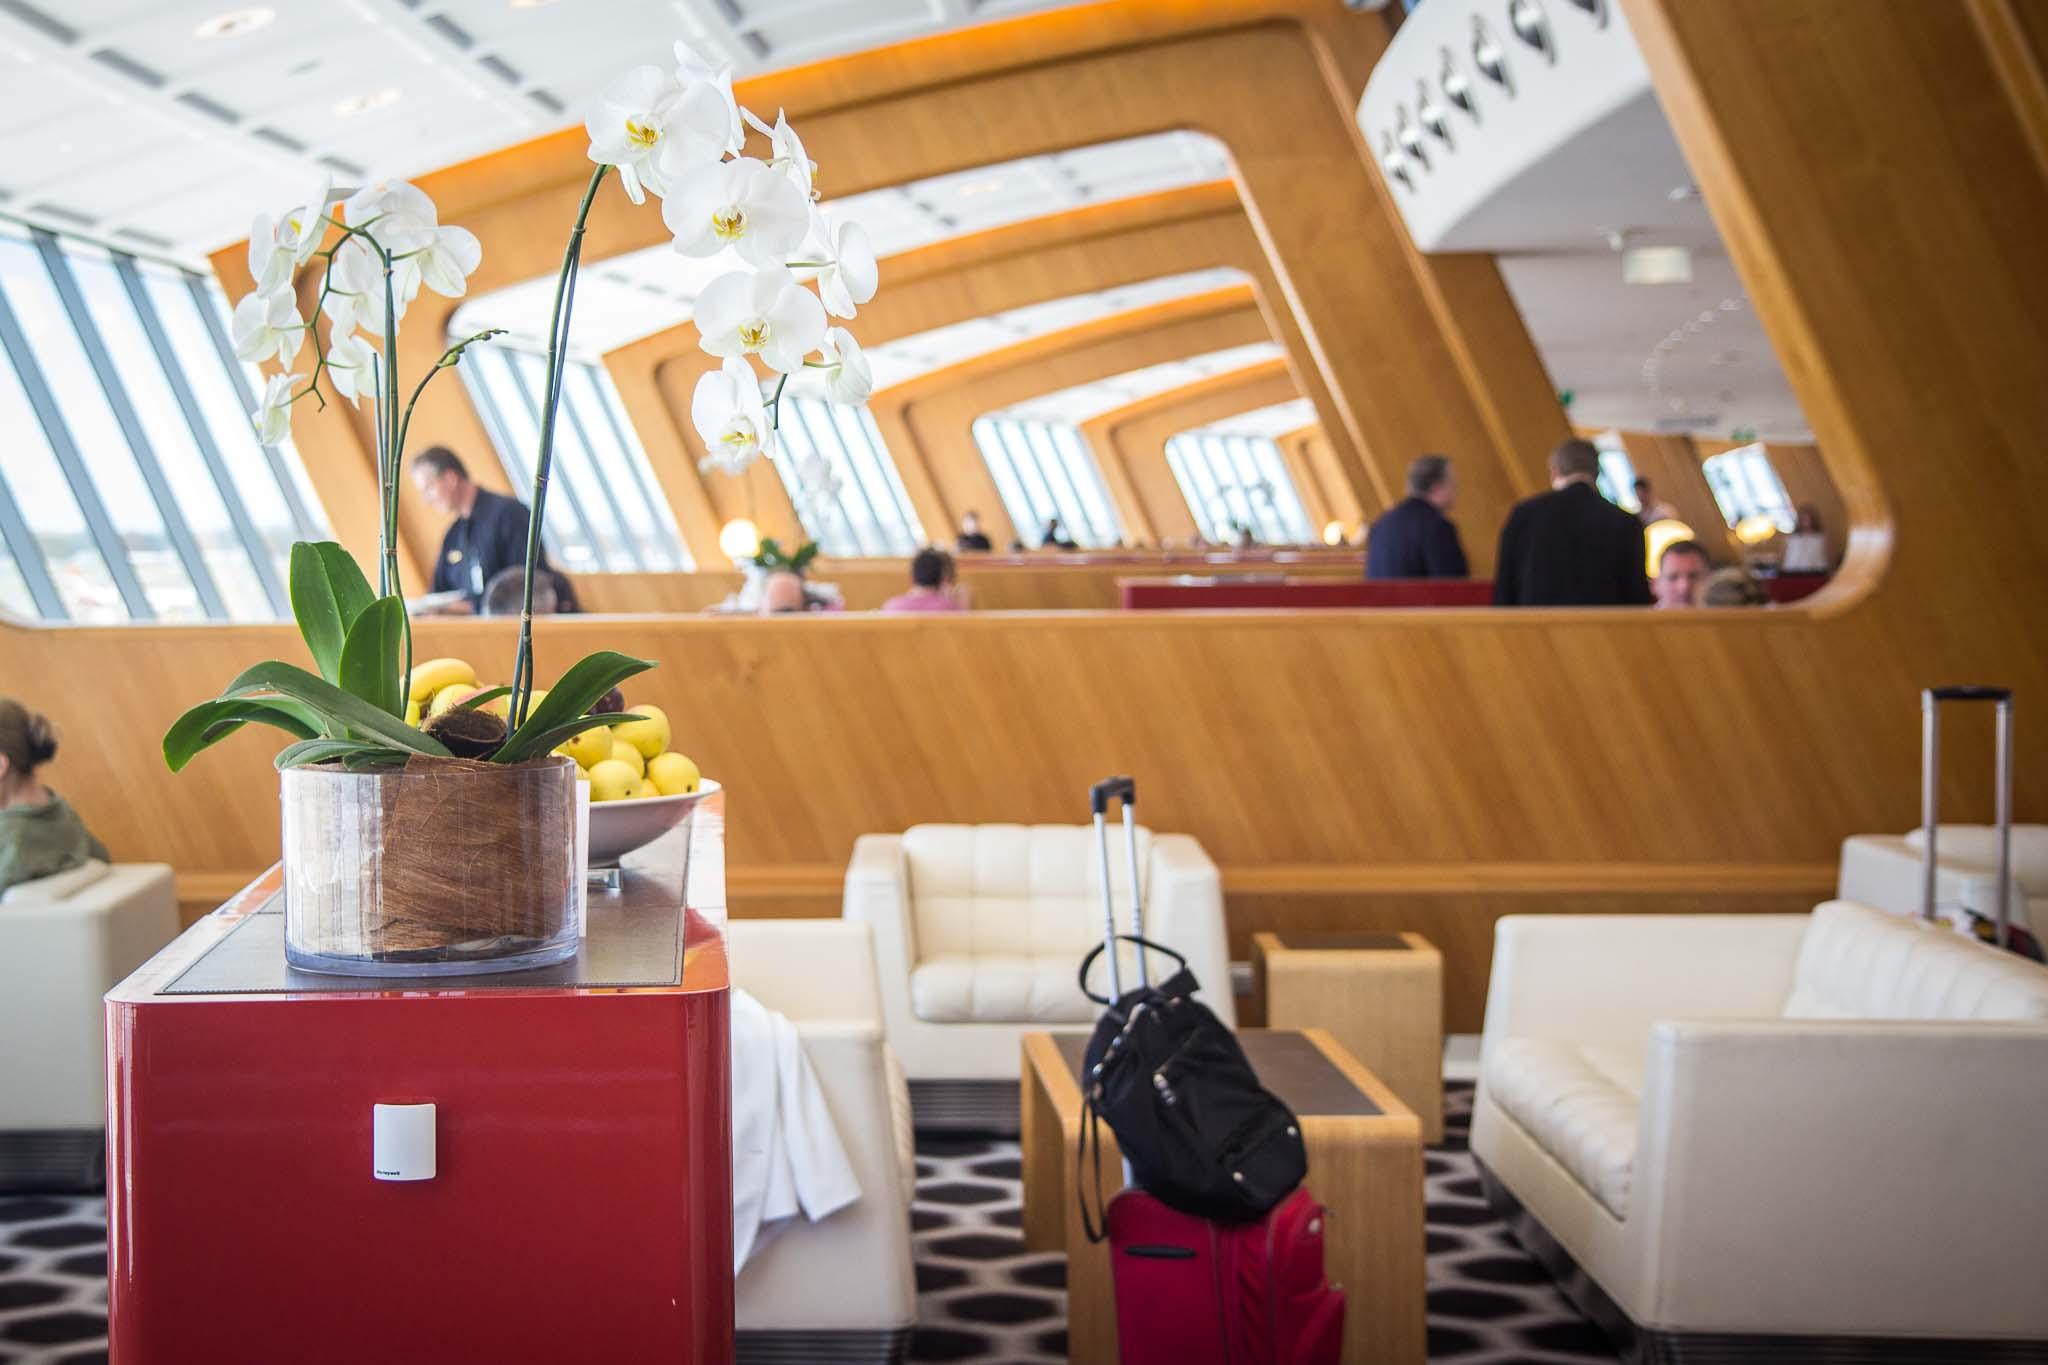 Qantas A380 London to Australia review